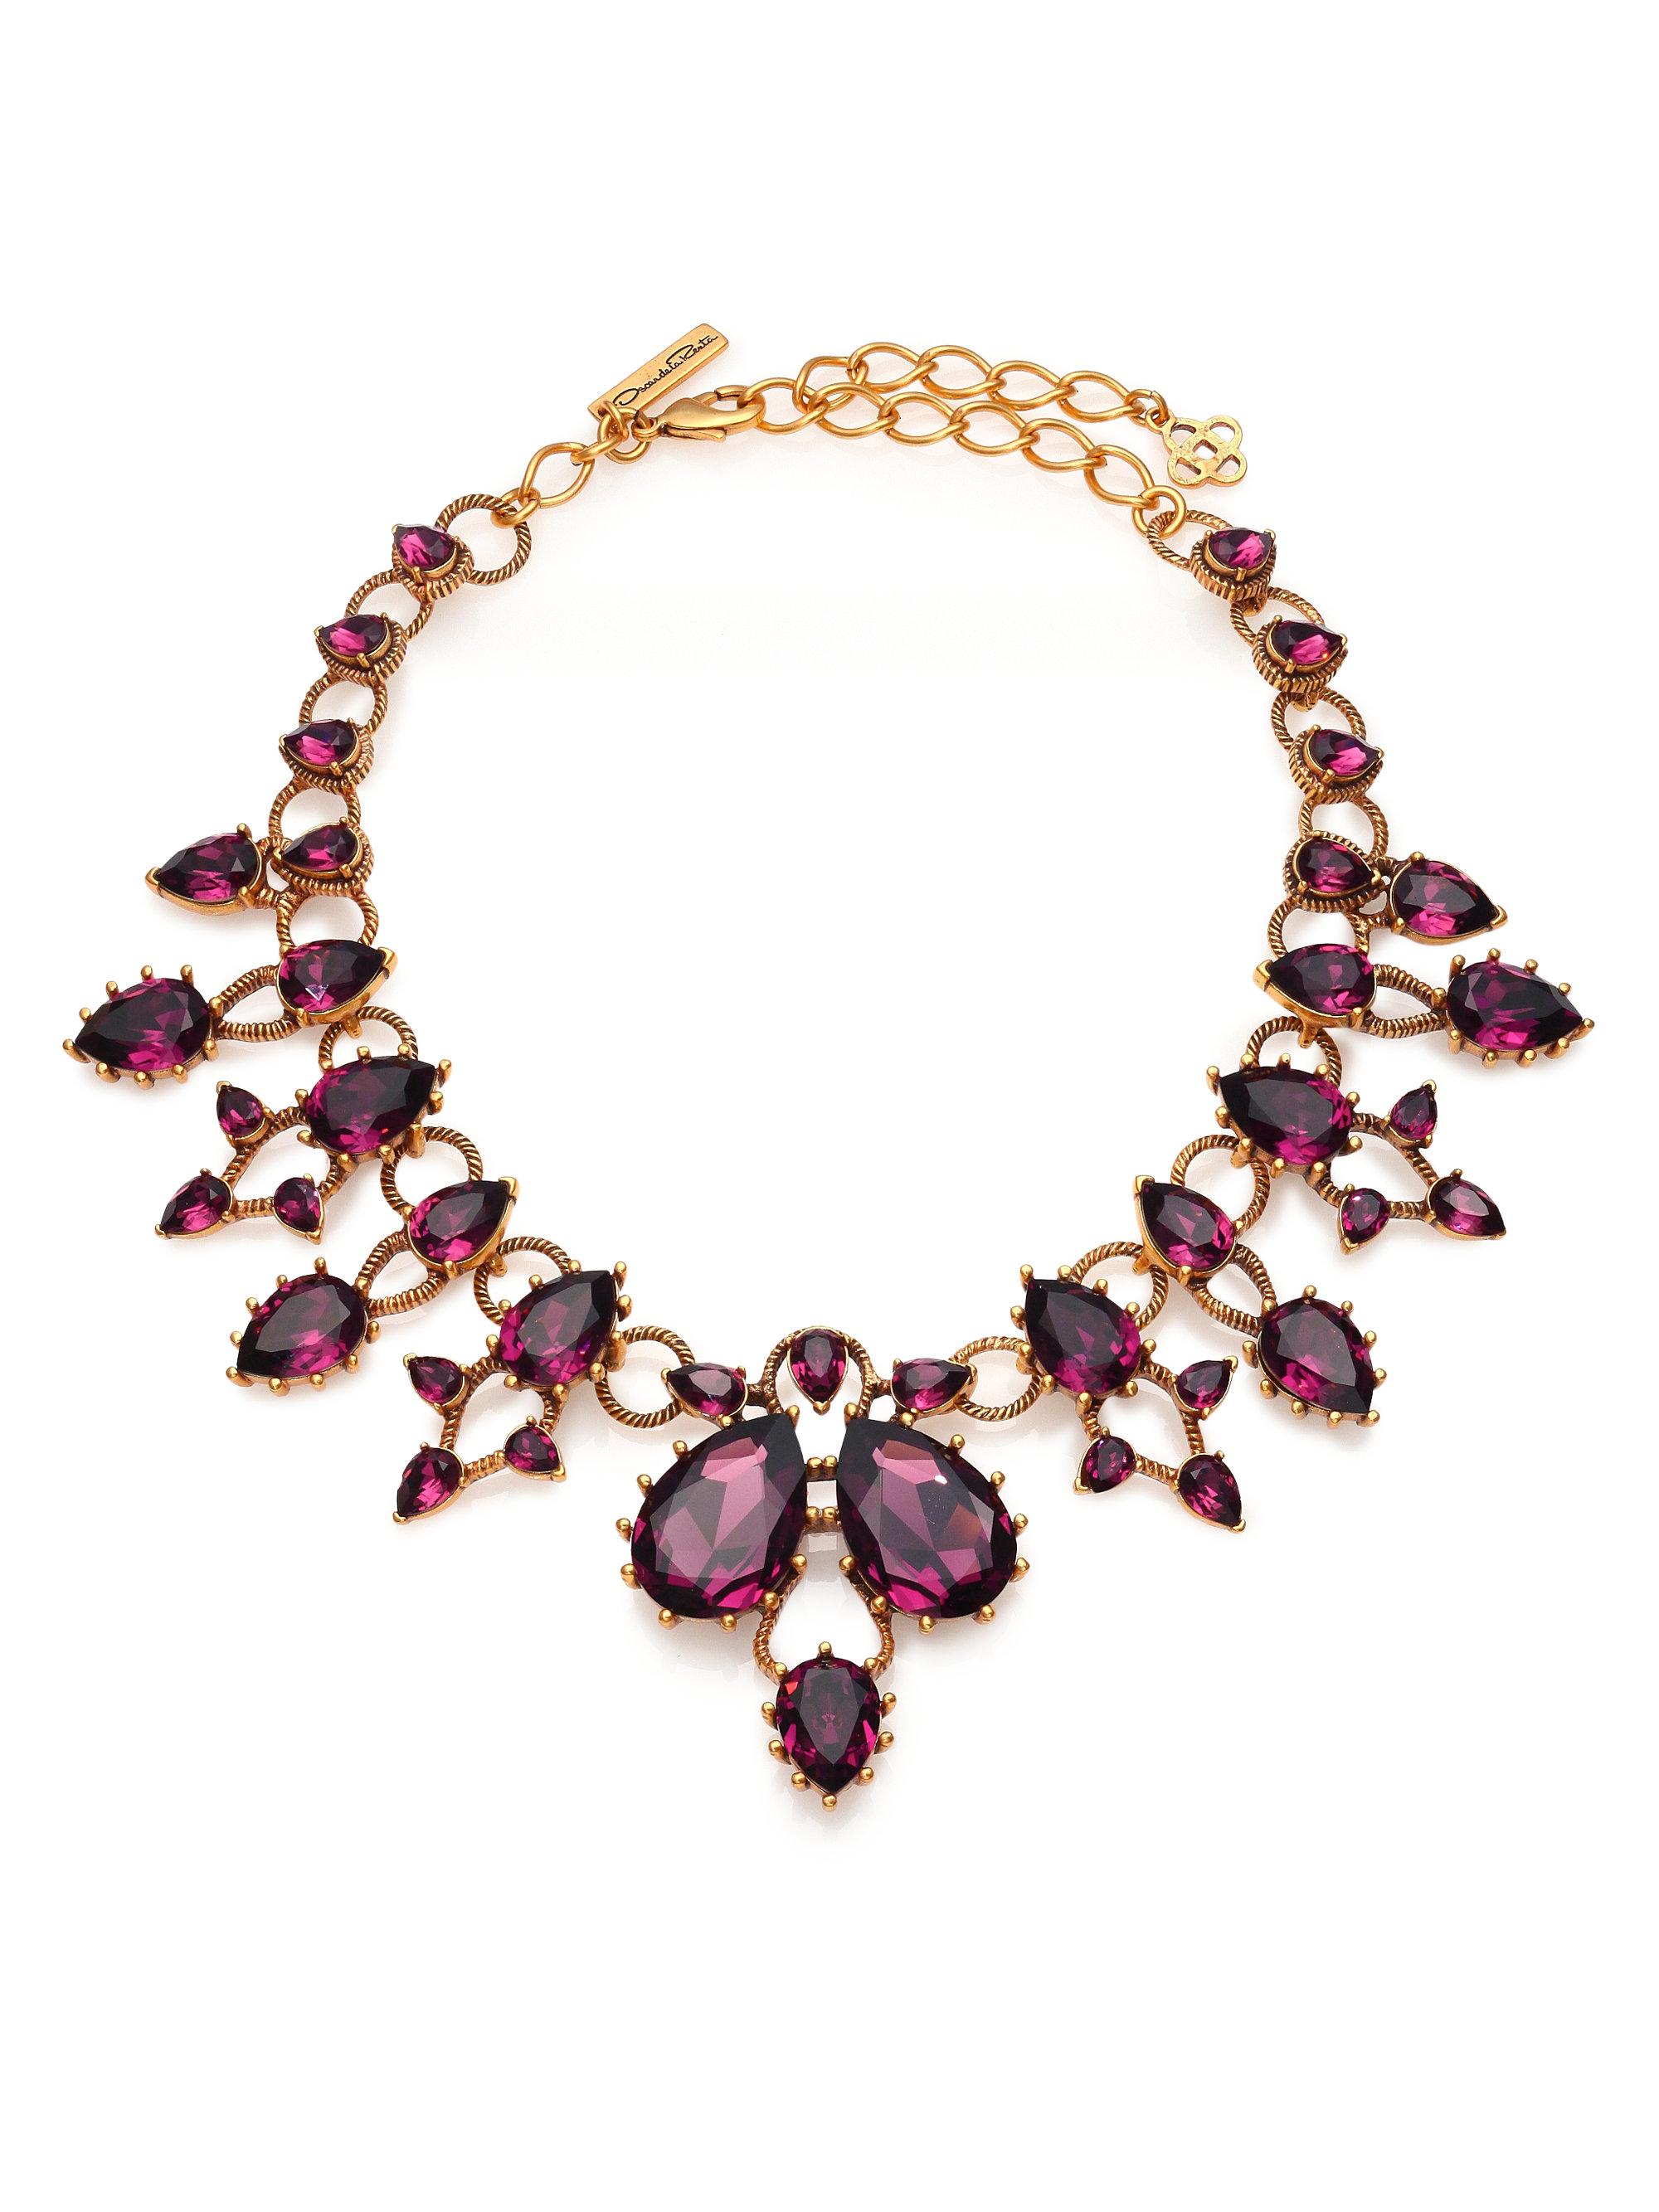 Modern Twist necklace - Pink & Purple Oscar De La Renta sas8yVm4